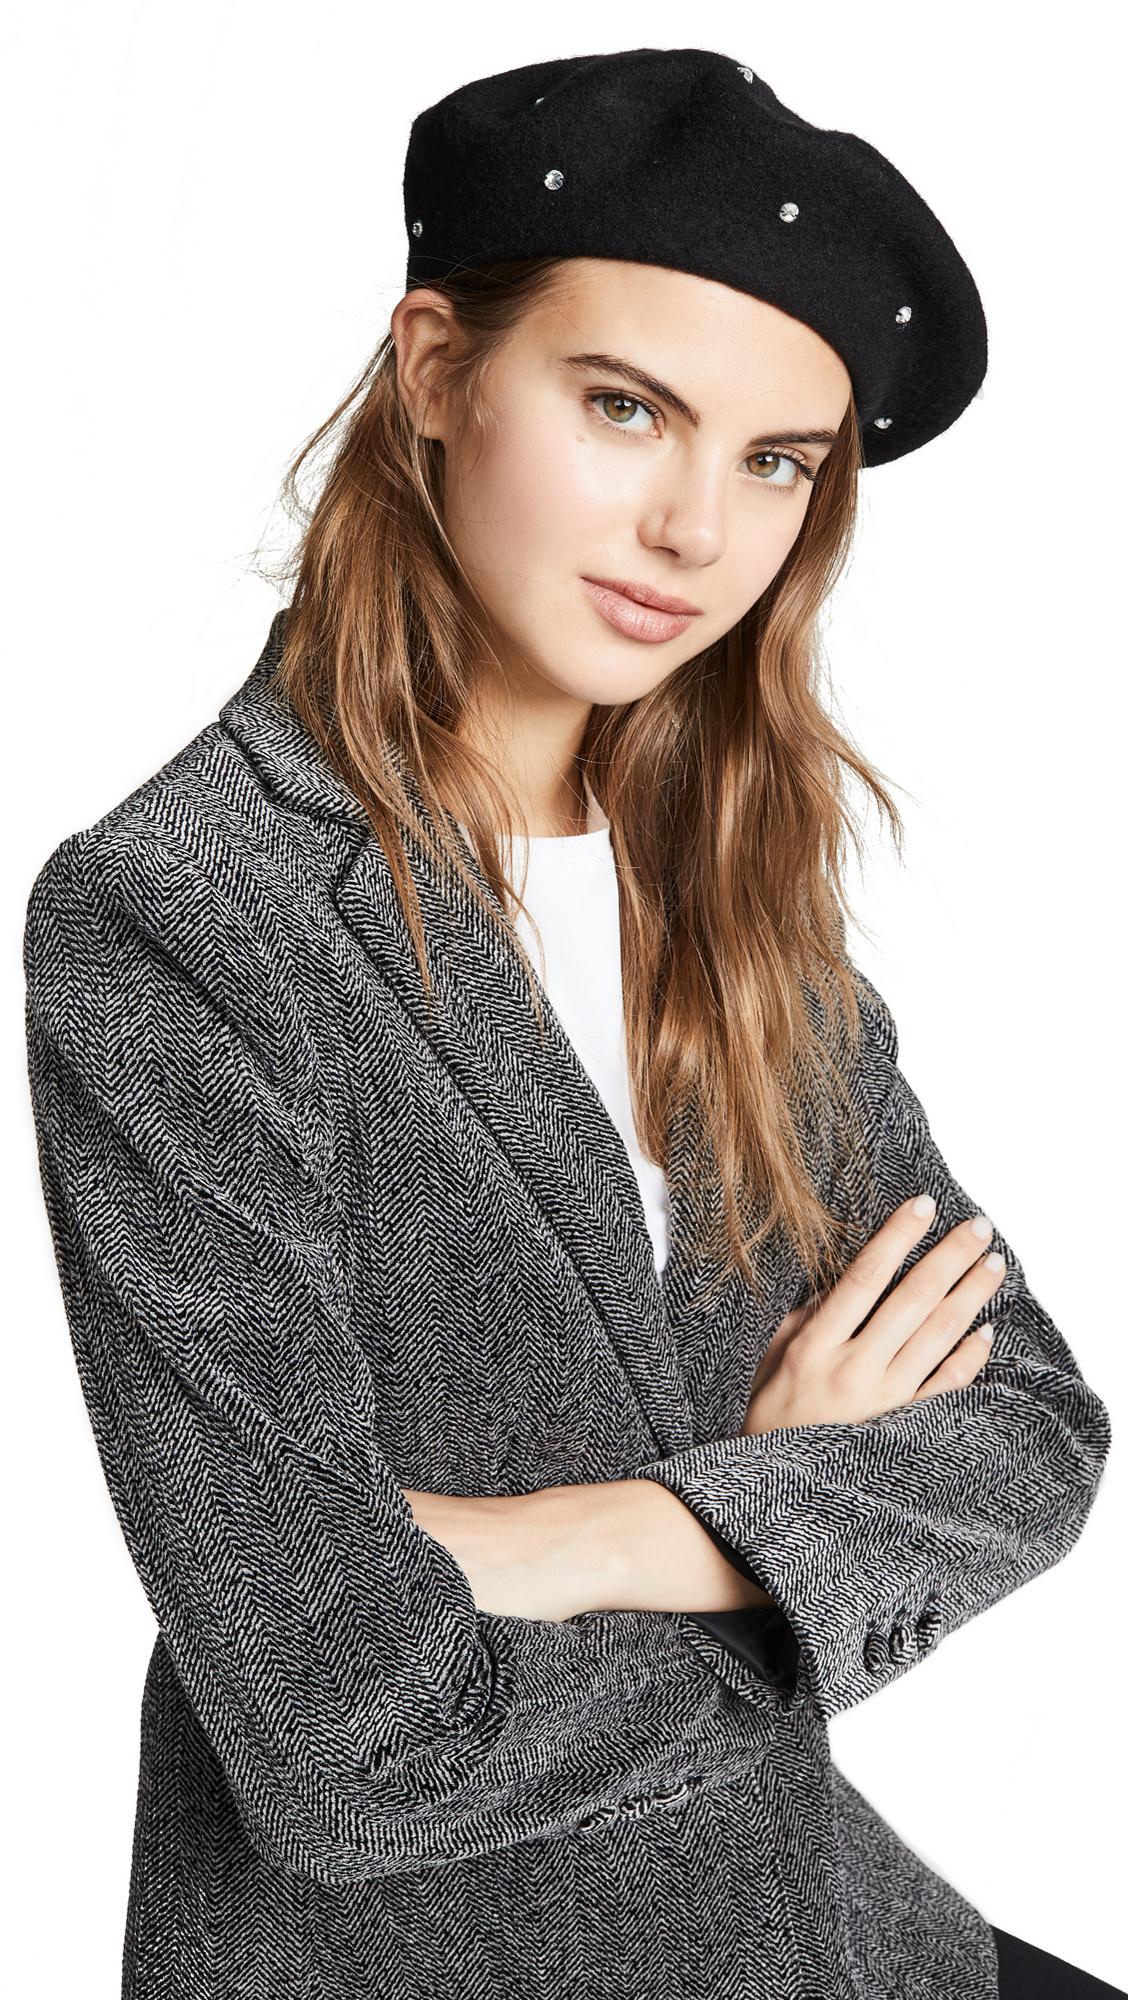 Kate Spade Bedazzled Beret Hat In Black Smoke  6b9432c004d